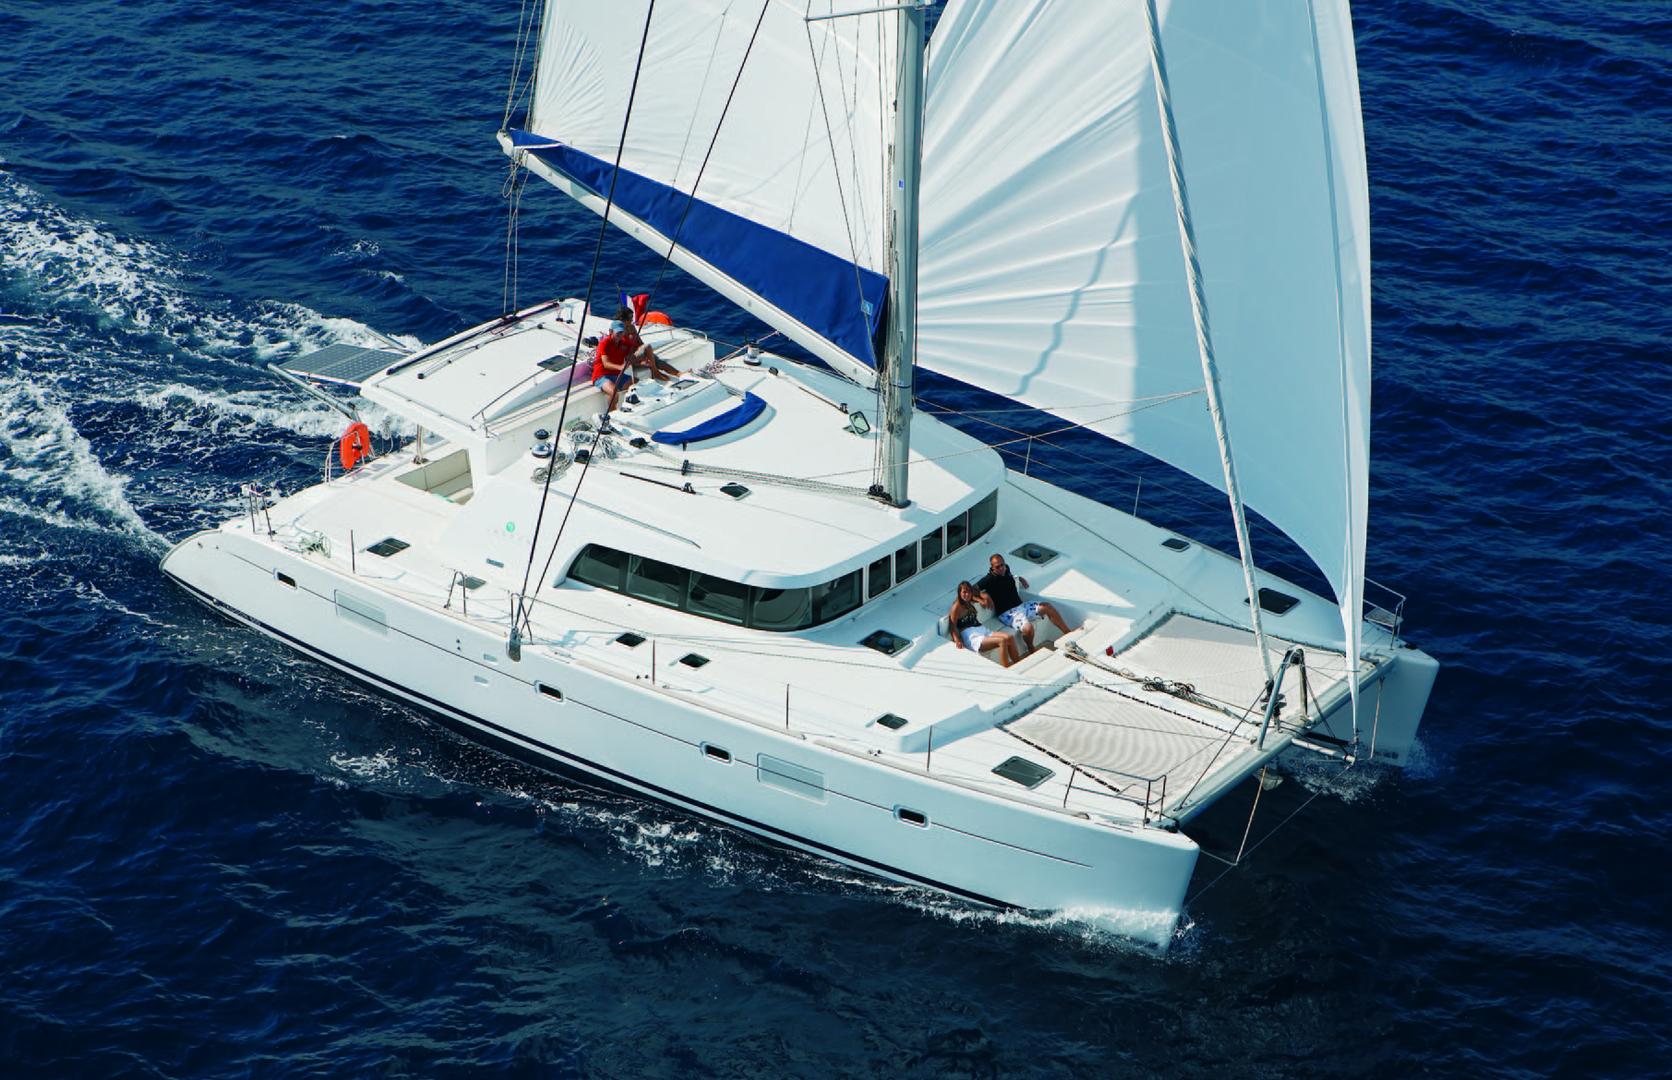 Luxury Kona Snorkel Sail